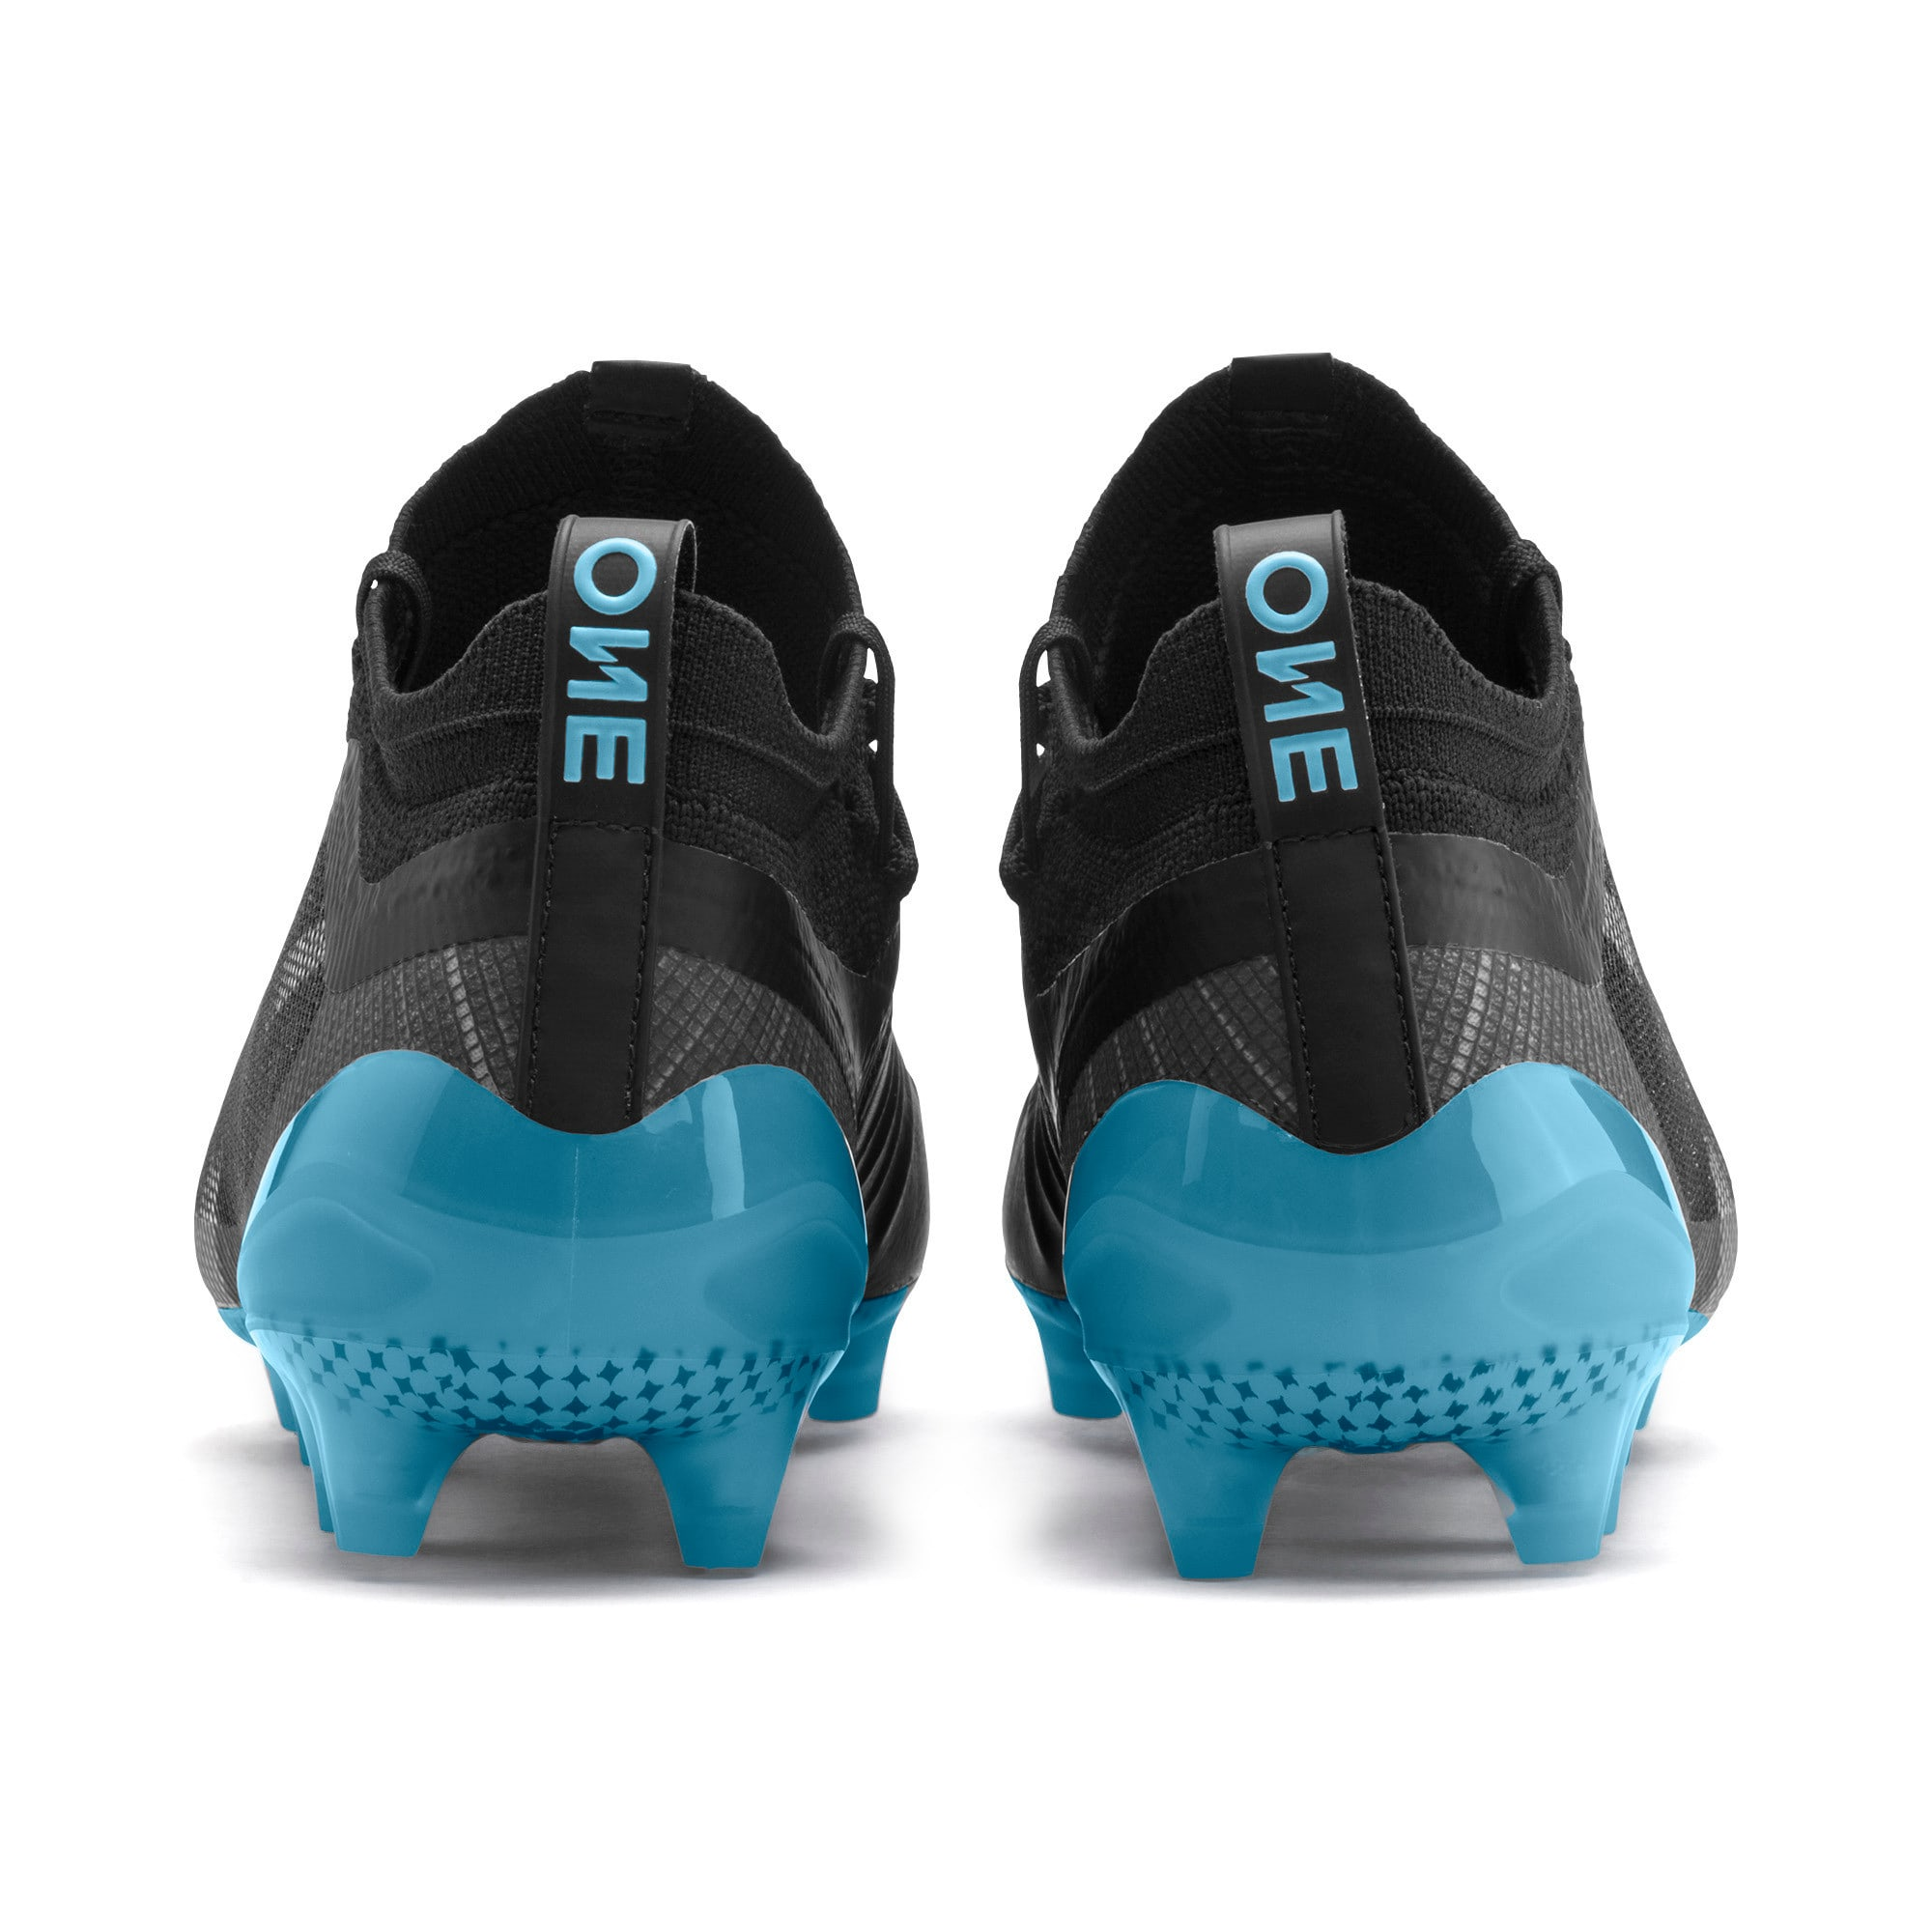 Thumbnail 4 of PUMA ONE 5.1 City FG/AG Men's Soccer Cleats, Black-Sky Blue-Silver, medium